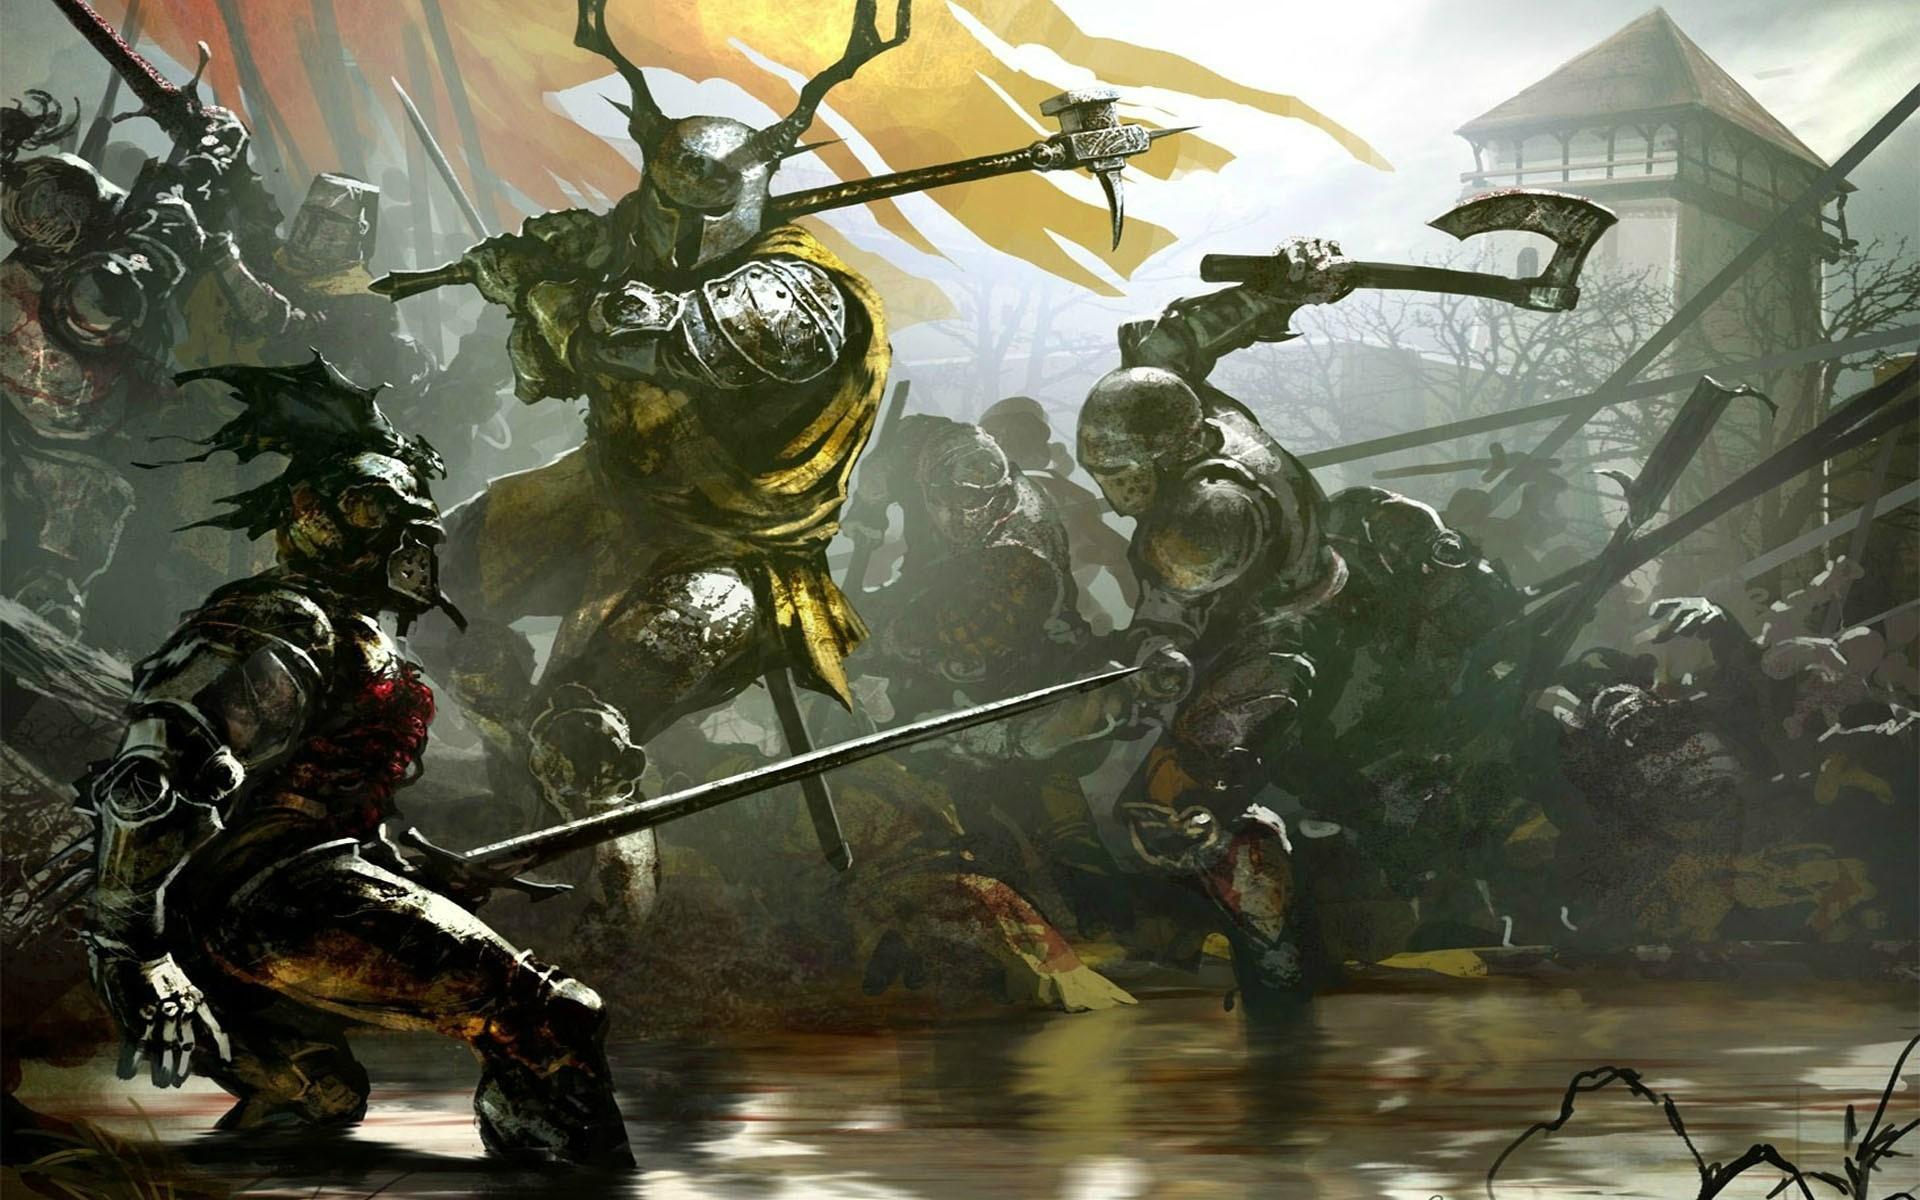 Wallpaper : Painting, Fantasy Art, Battle, Soldier